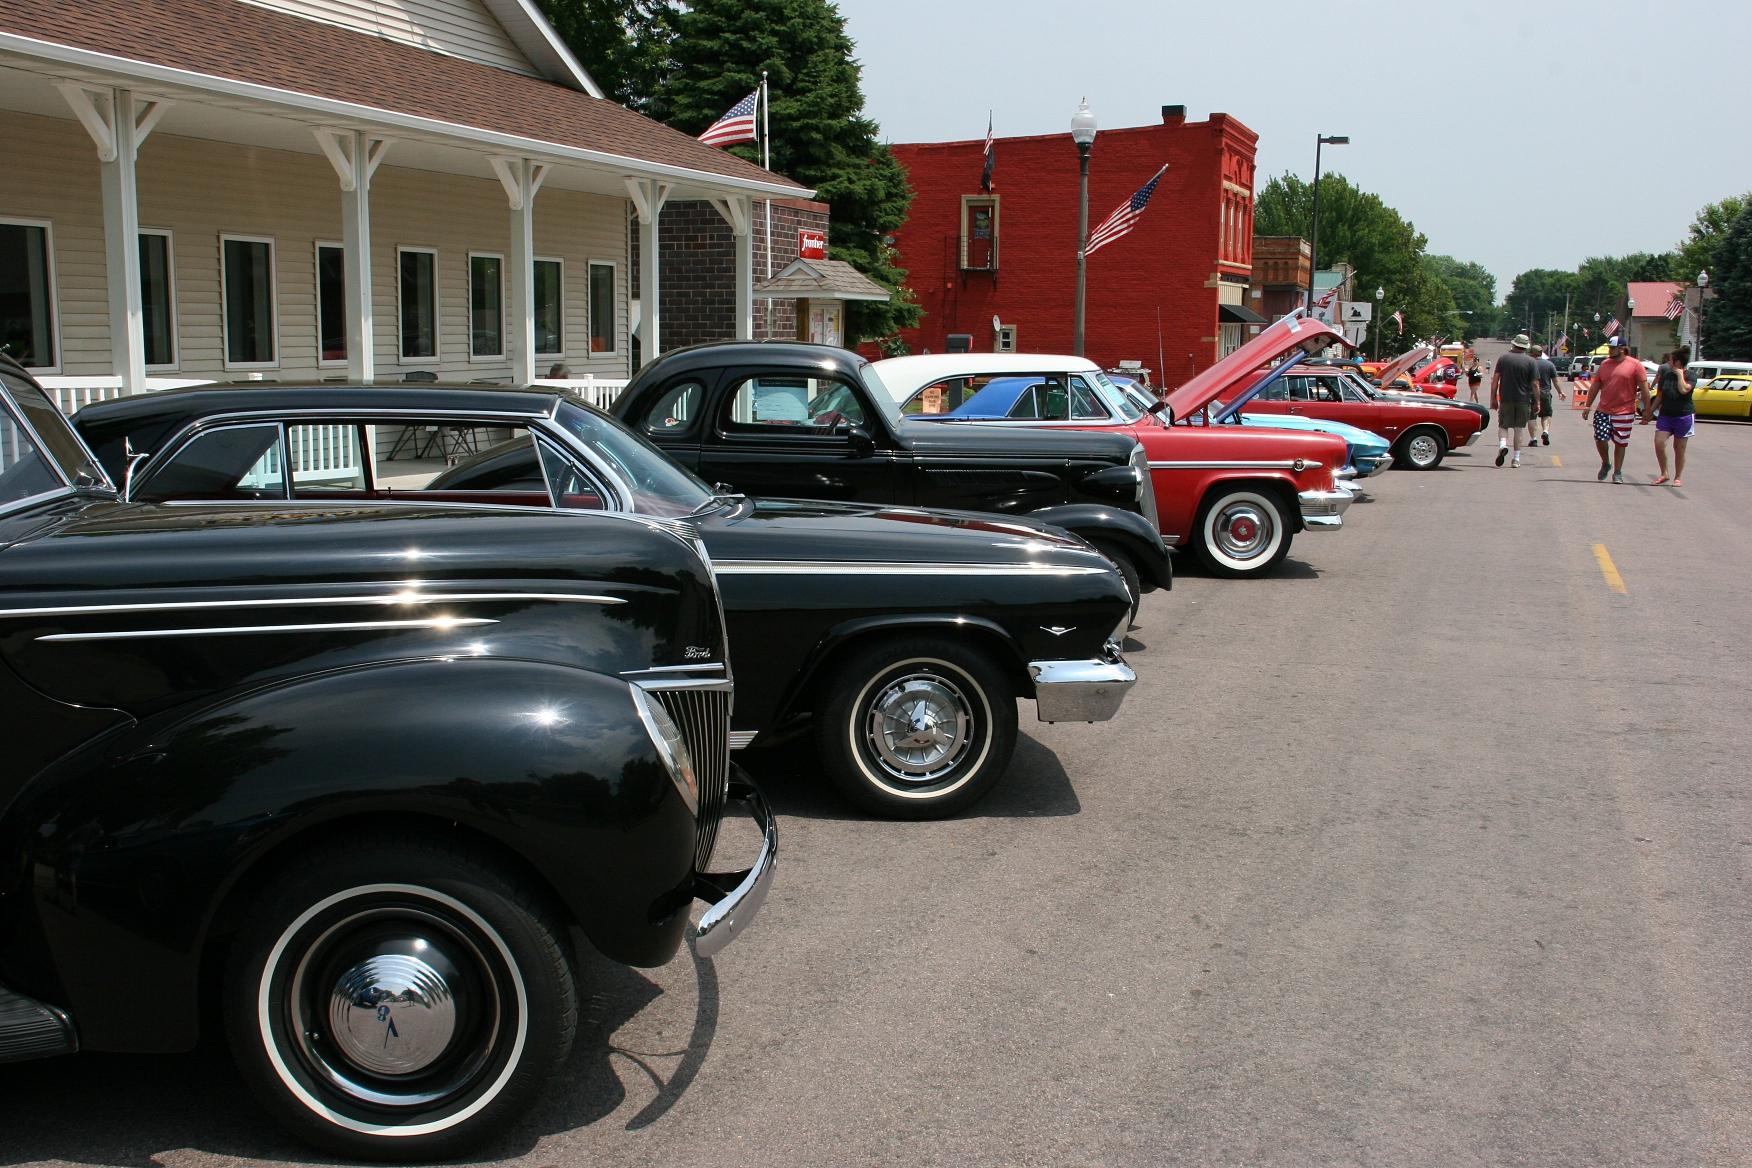 In Elysian A Memorable Small Town Minnesota Summer Celebration - Elysian park car show 2018